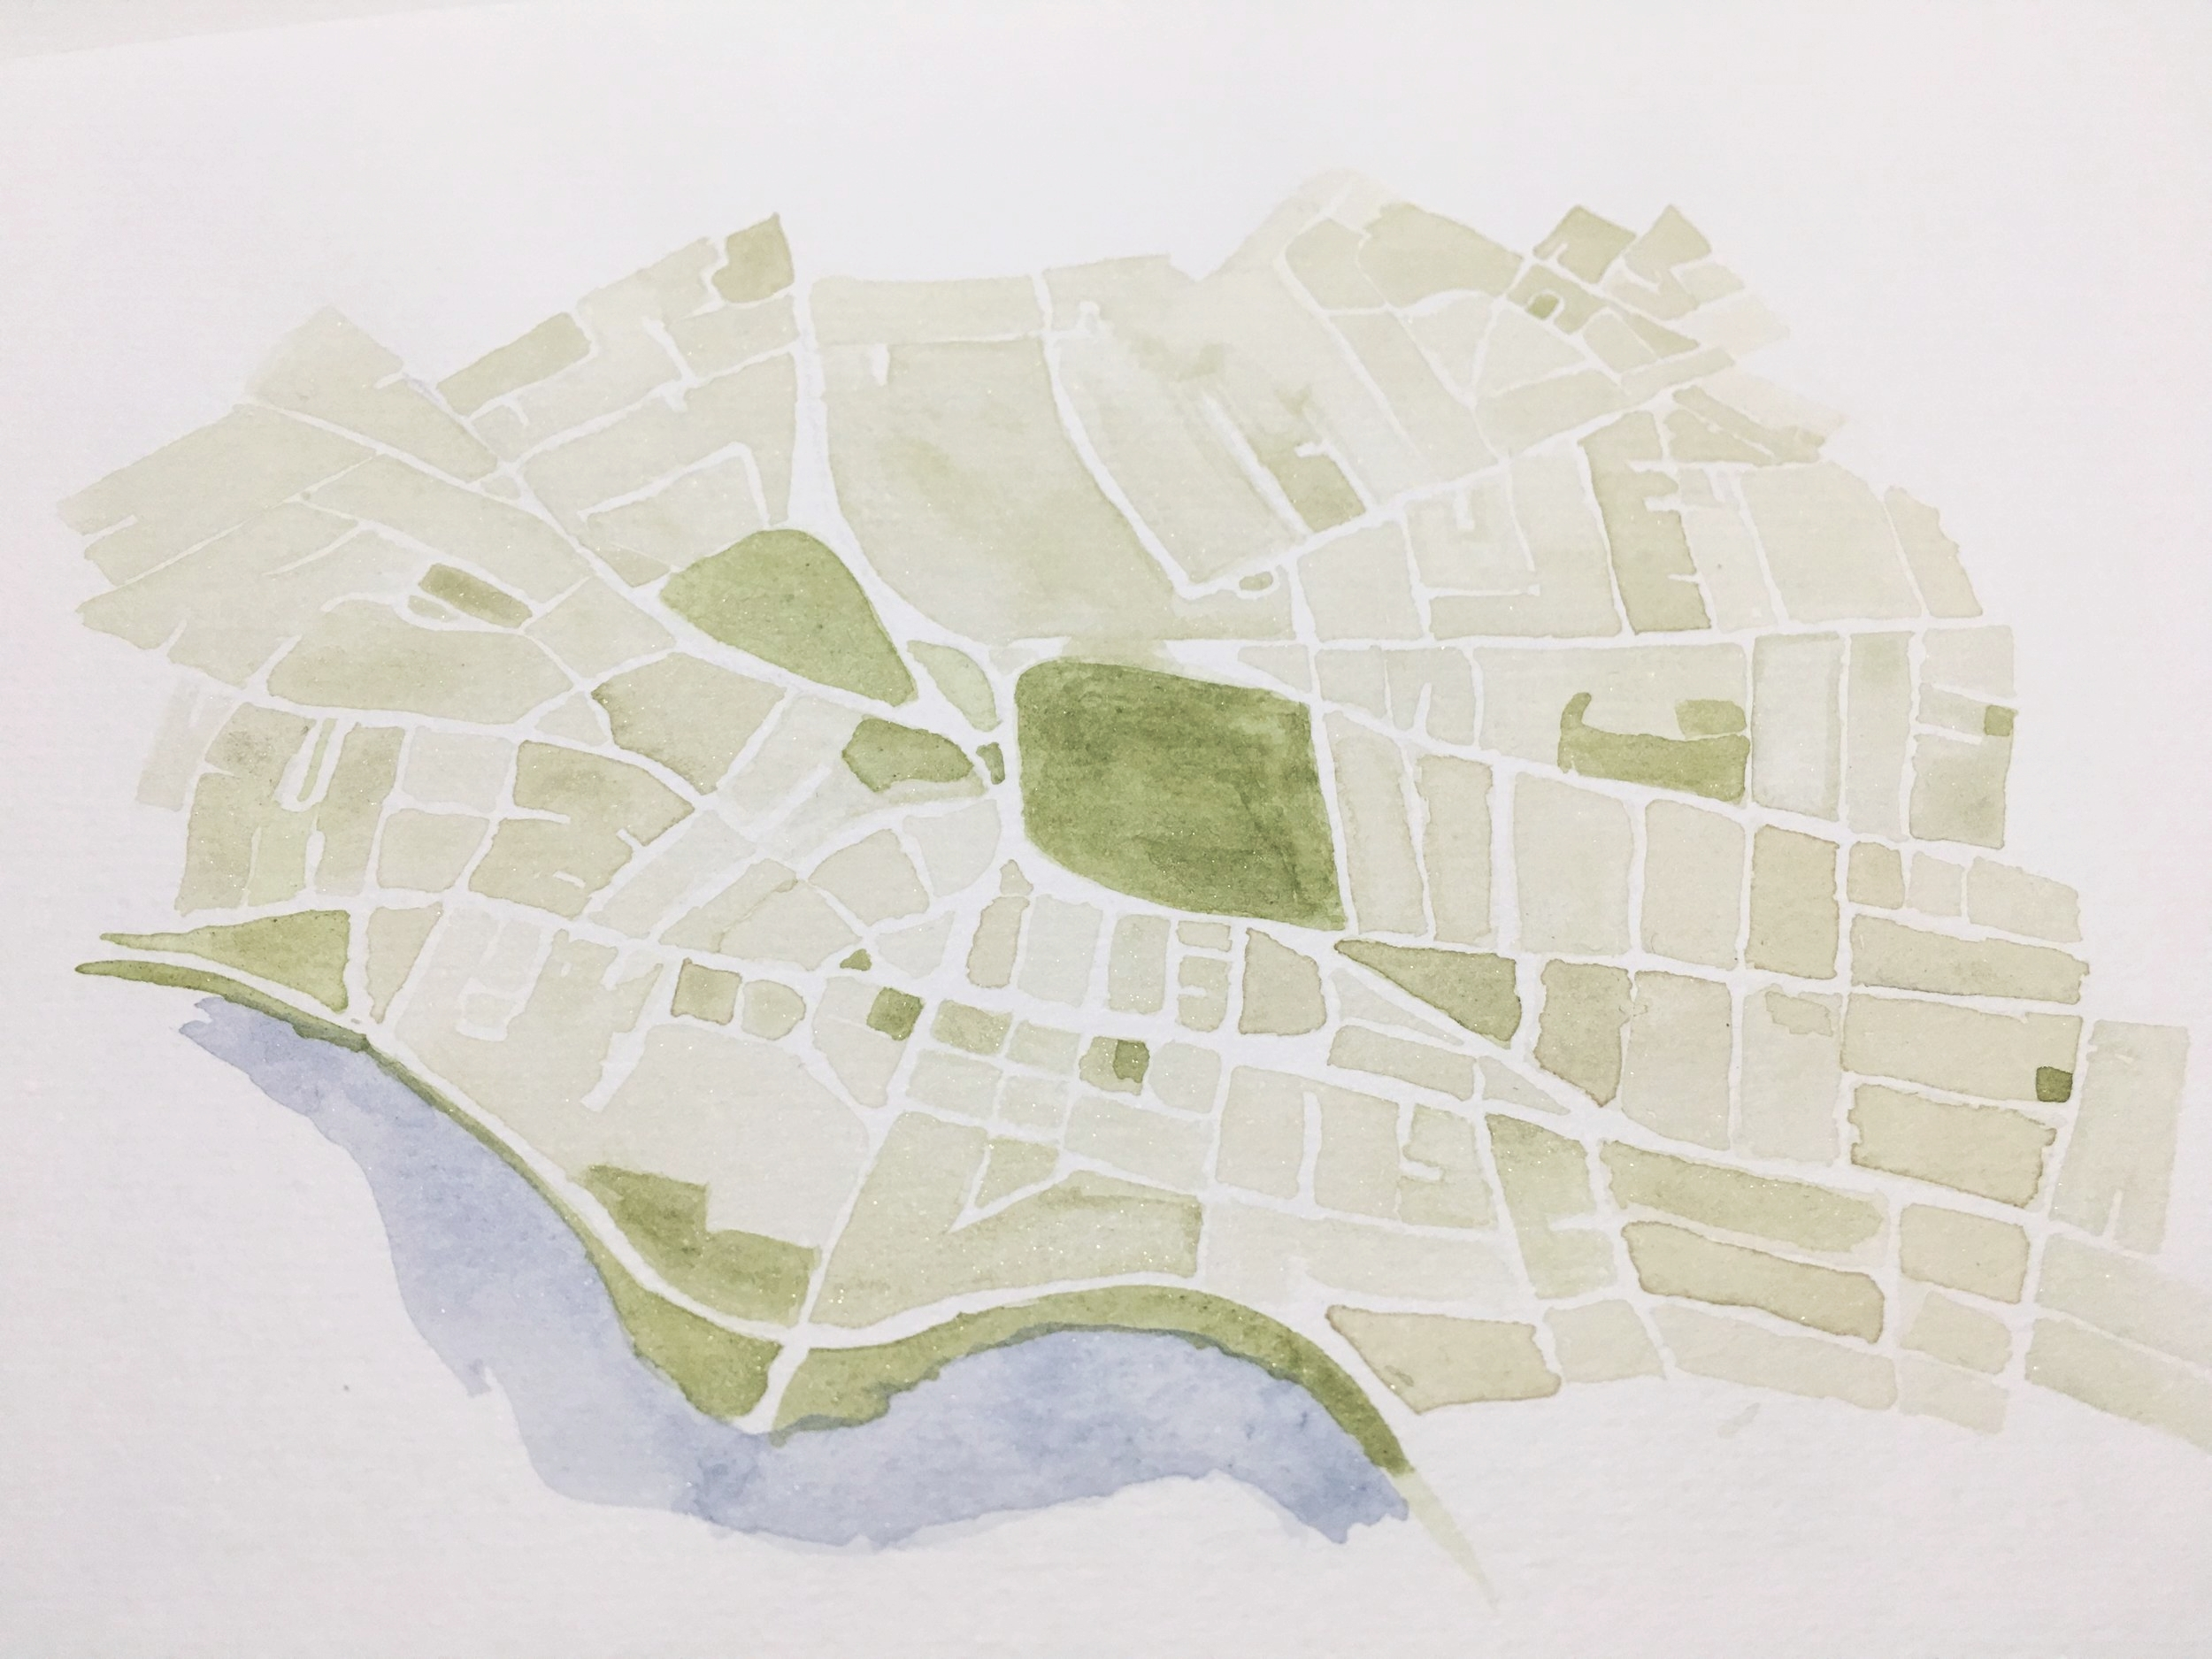 cambridge massachusetts watercolor map